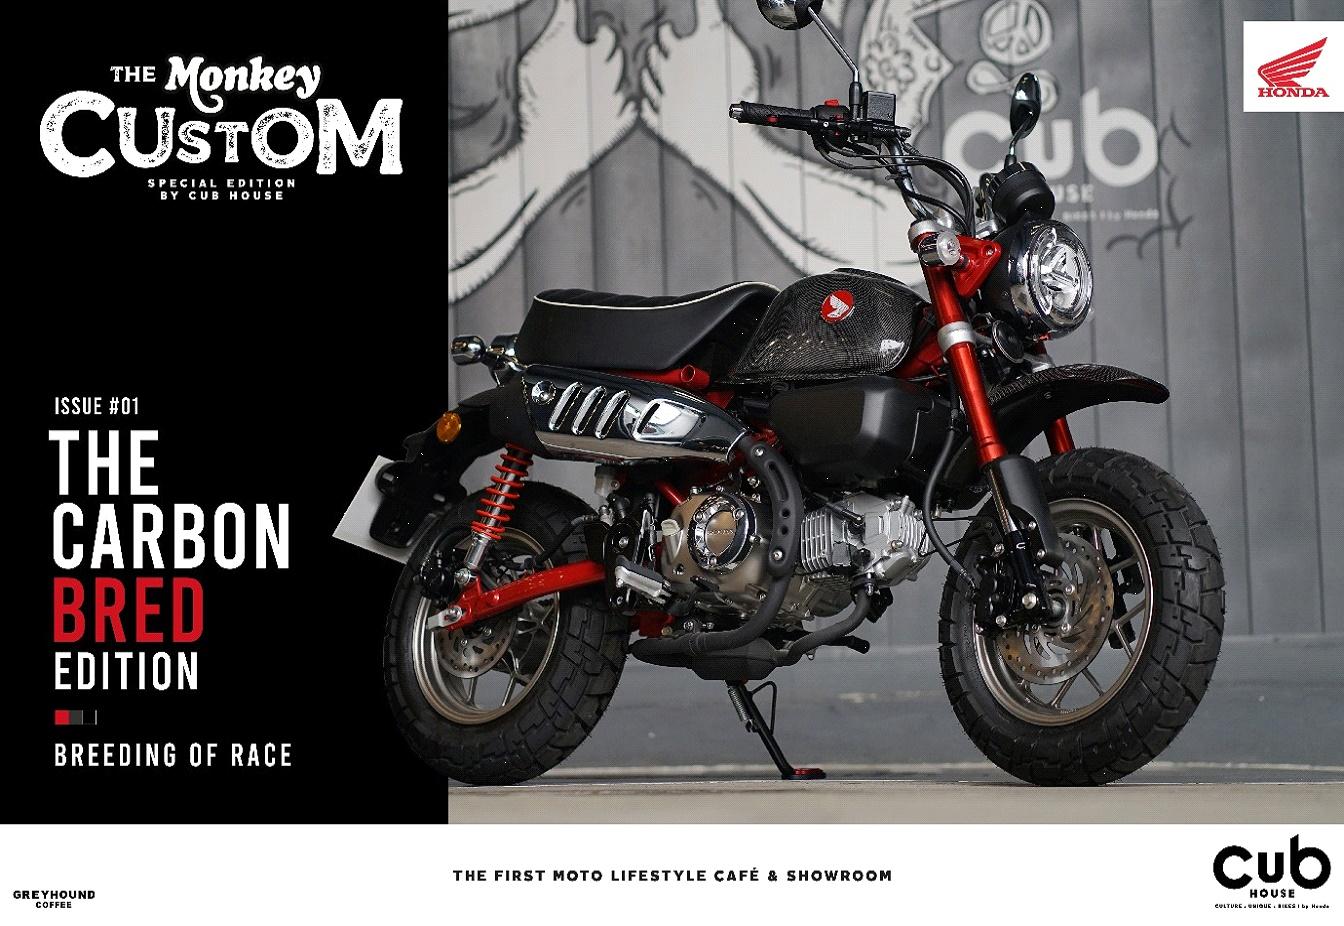 Honda Monkey 125 2020 รุ่นTHE CARBON BRED EDITION